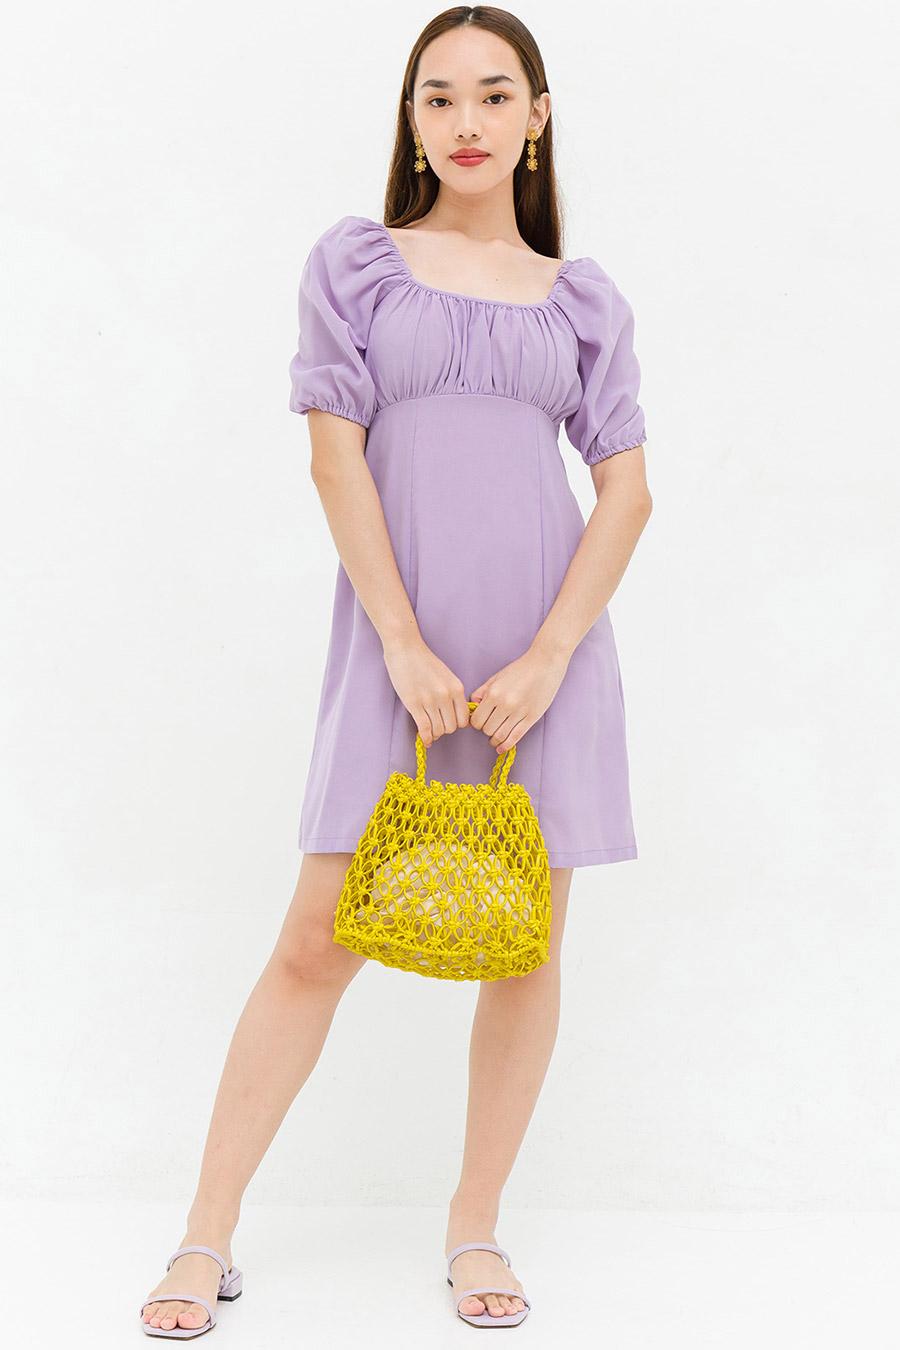 ANNABELLA DRESS - LAVENDER